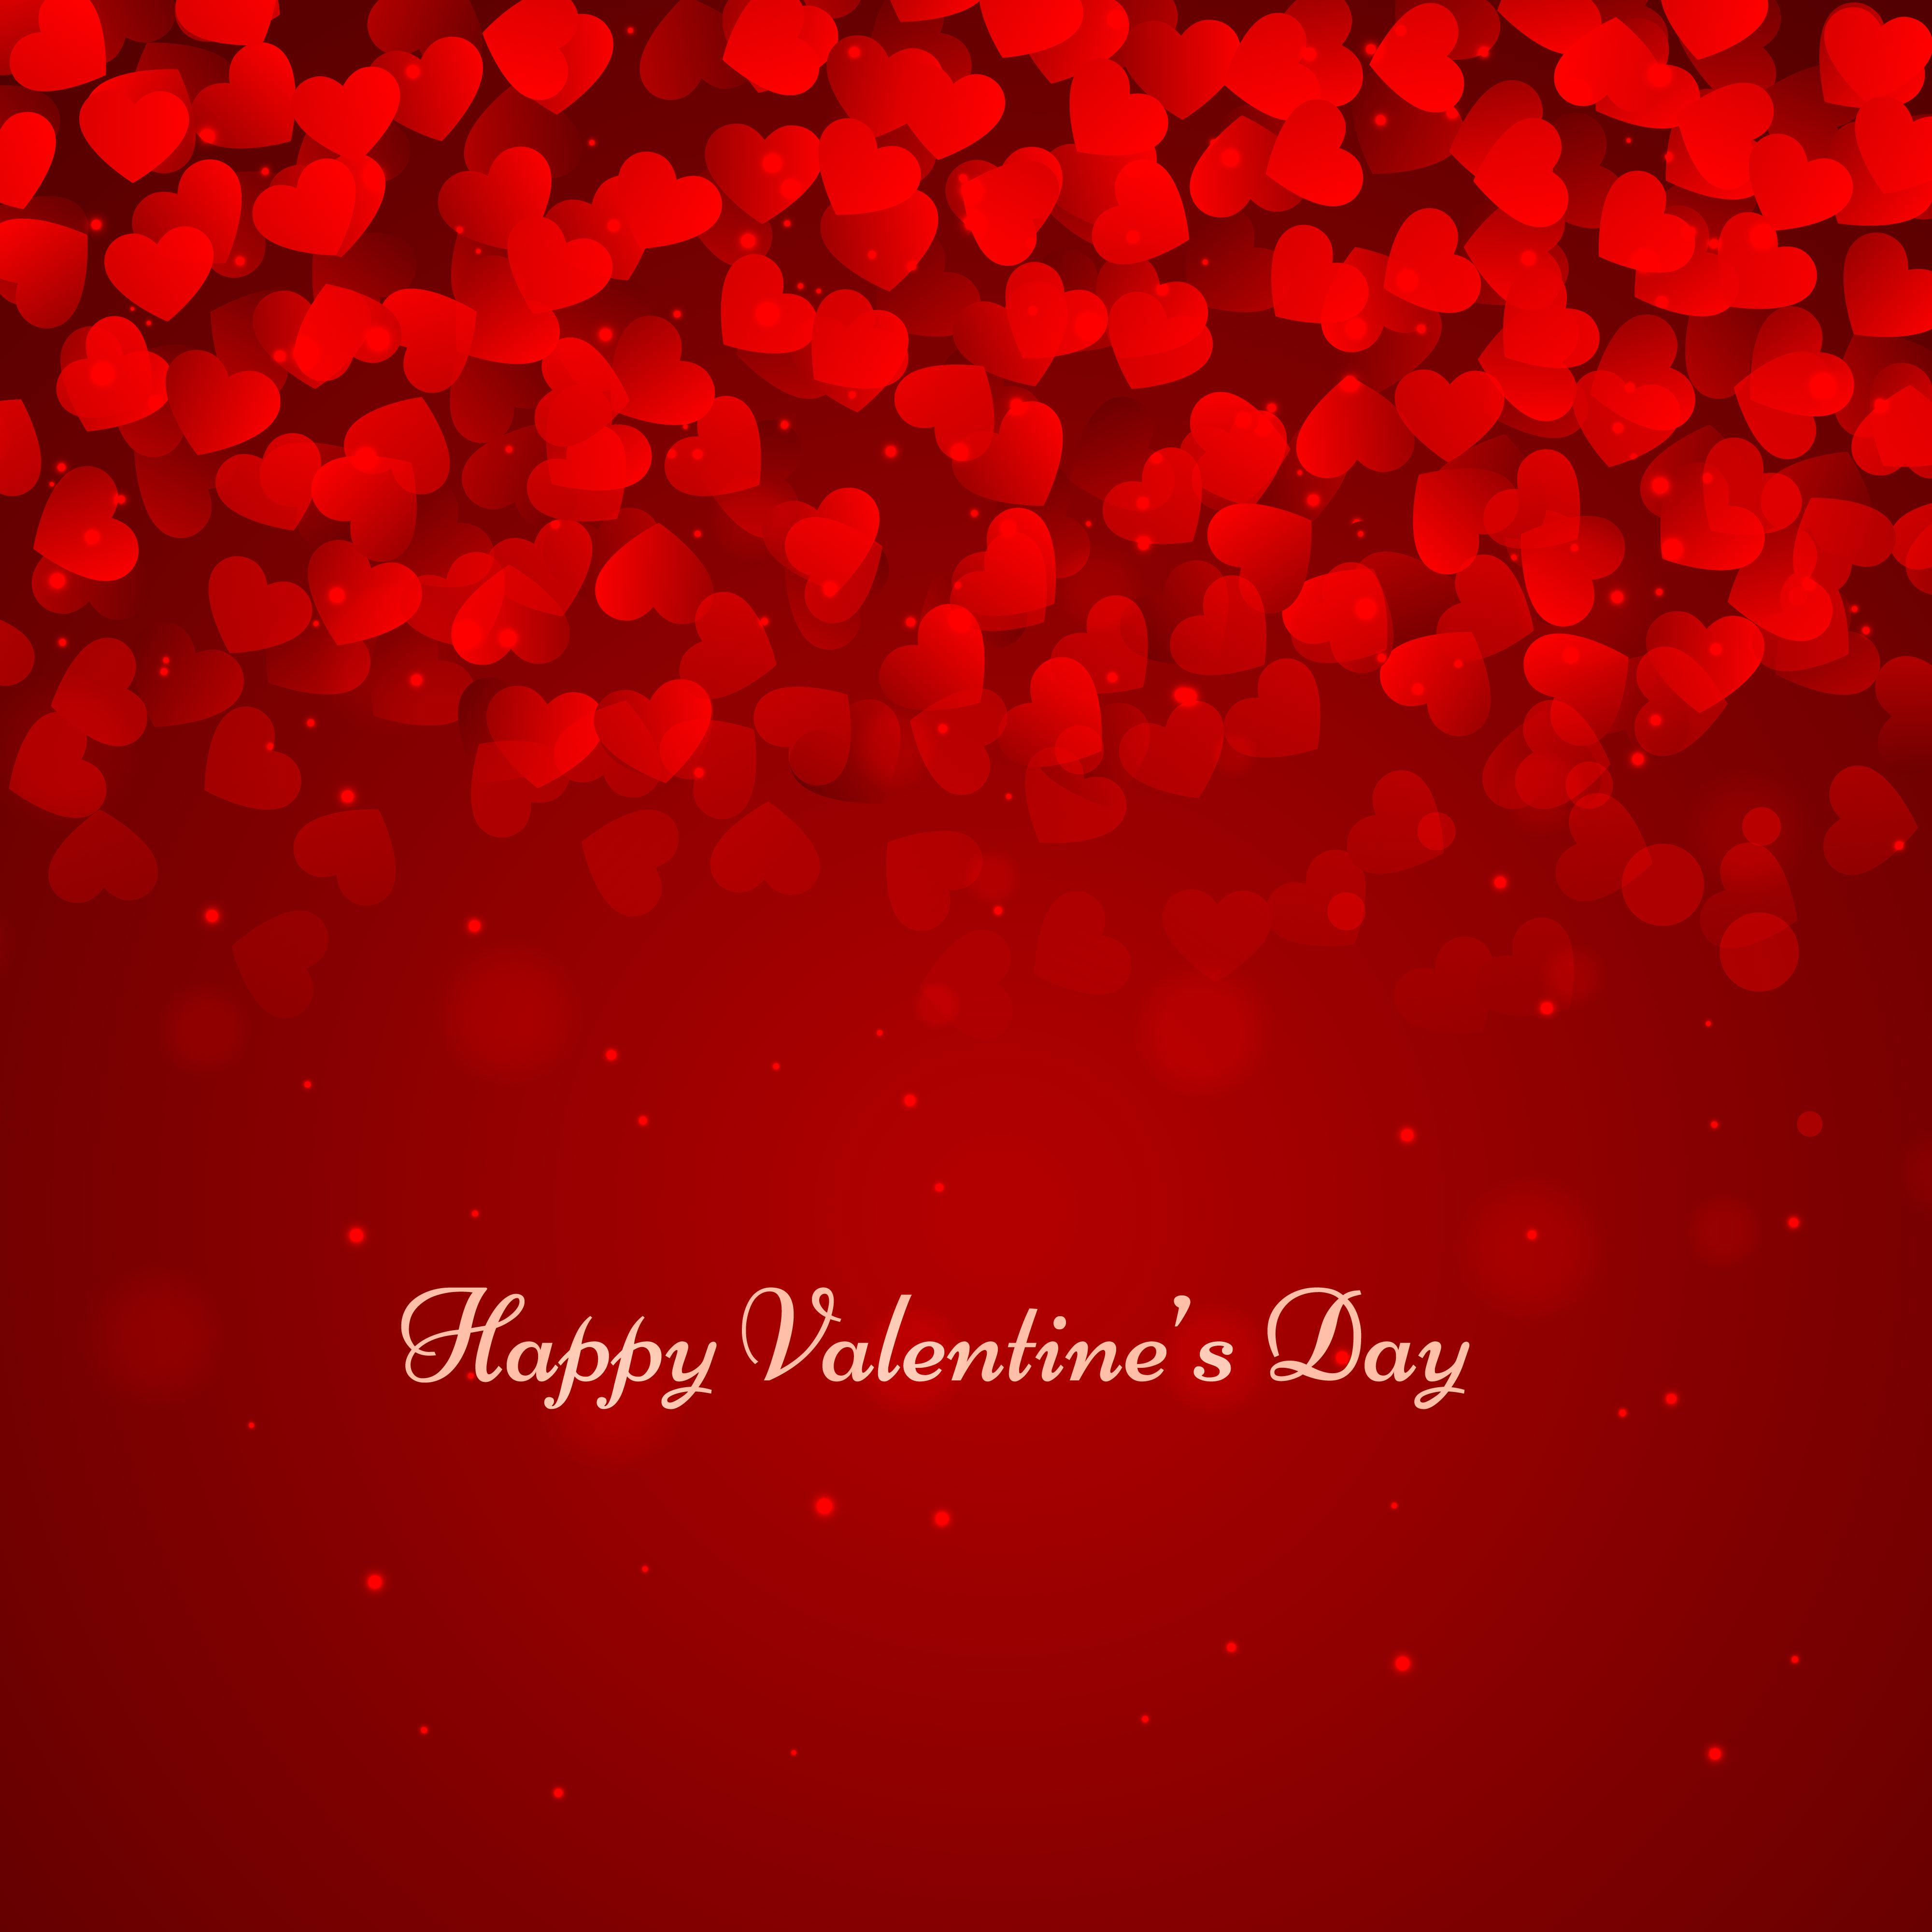 Valentine Day: Happy Valentines Day Background Vector Design Illustration